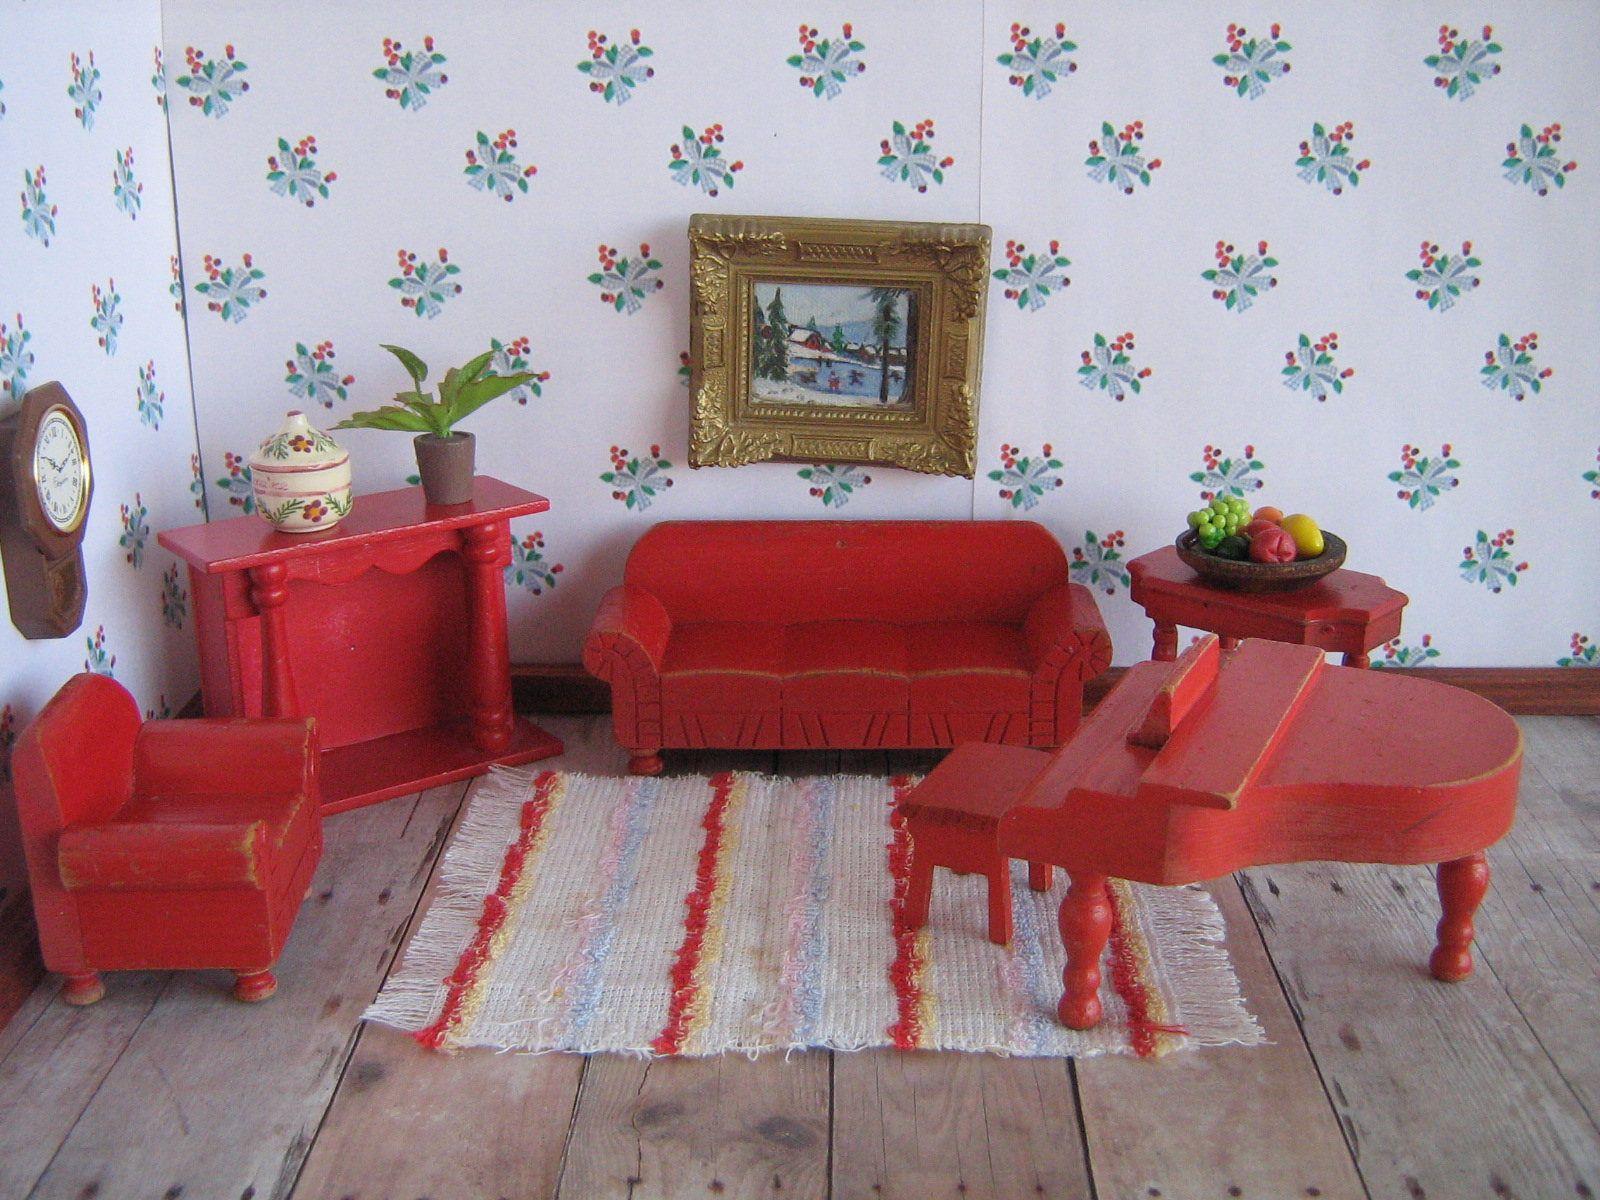 Vintage 40s Strombecker Wooden Dollhouse Furniture - Red Living Room